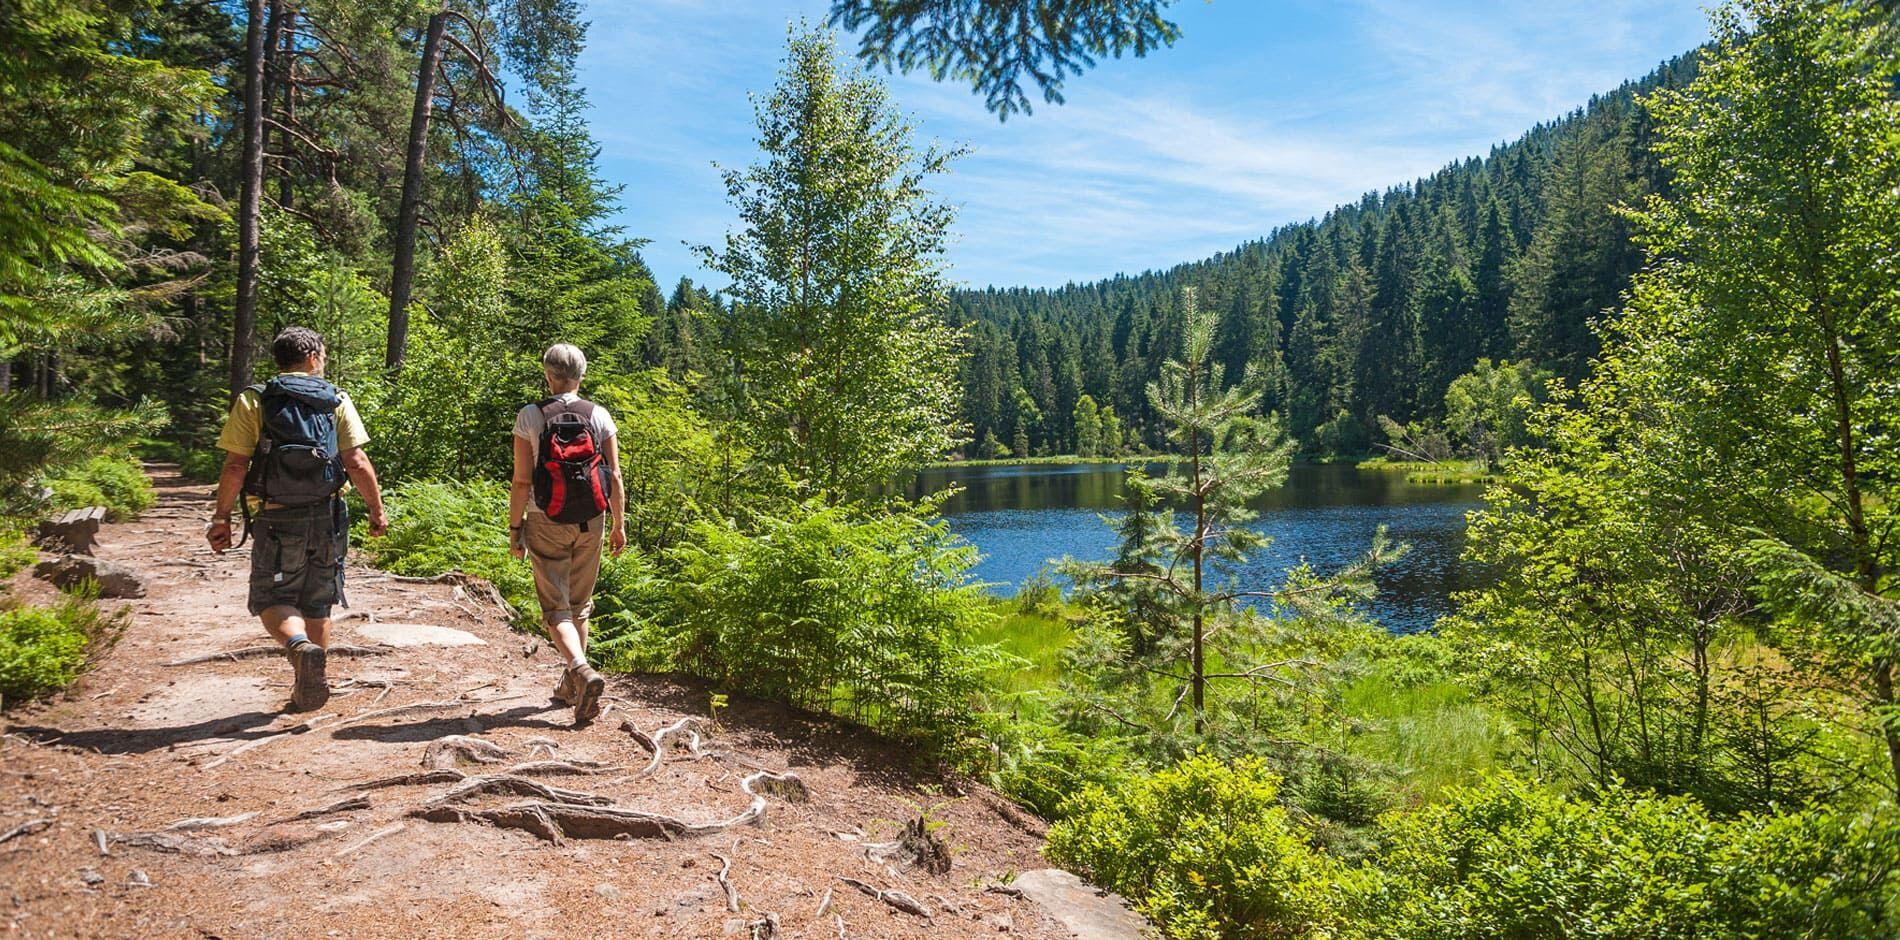 Vacances de randonnées en Belgique avec daydreams